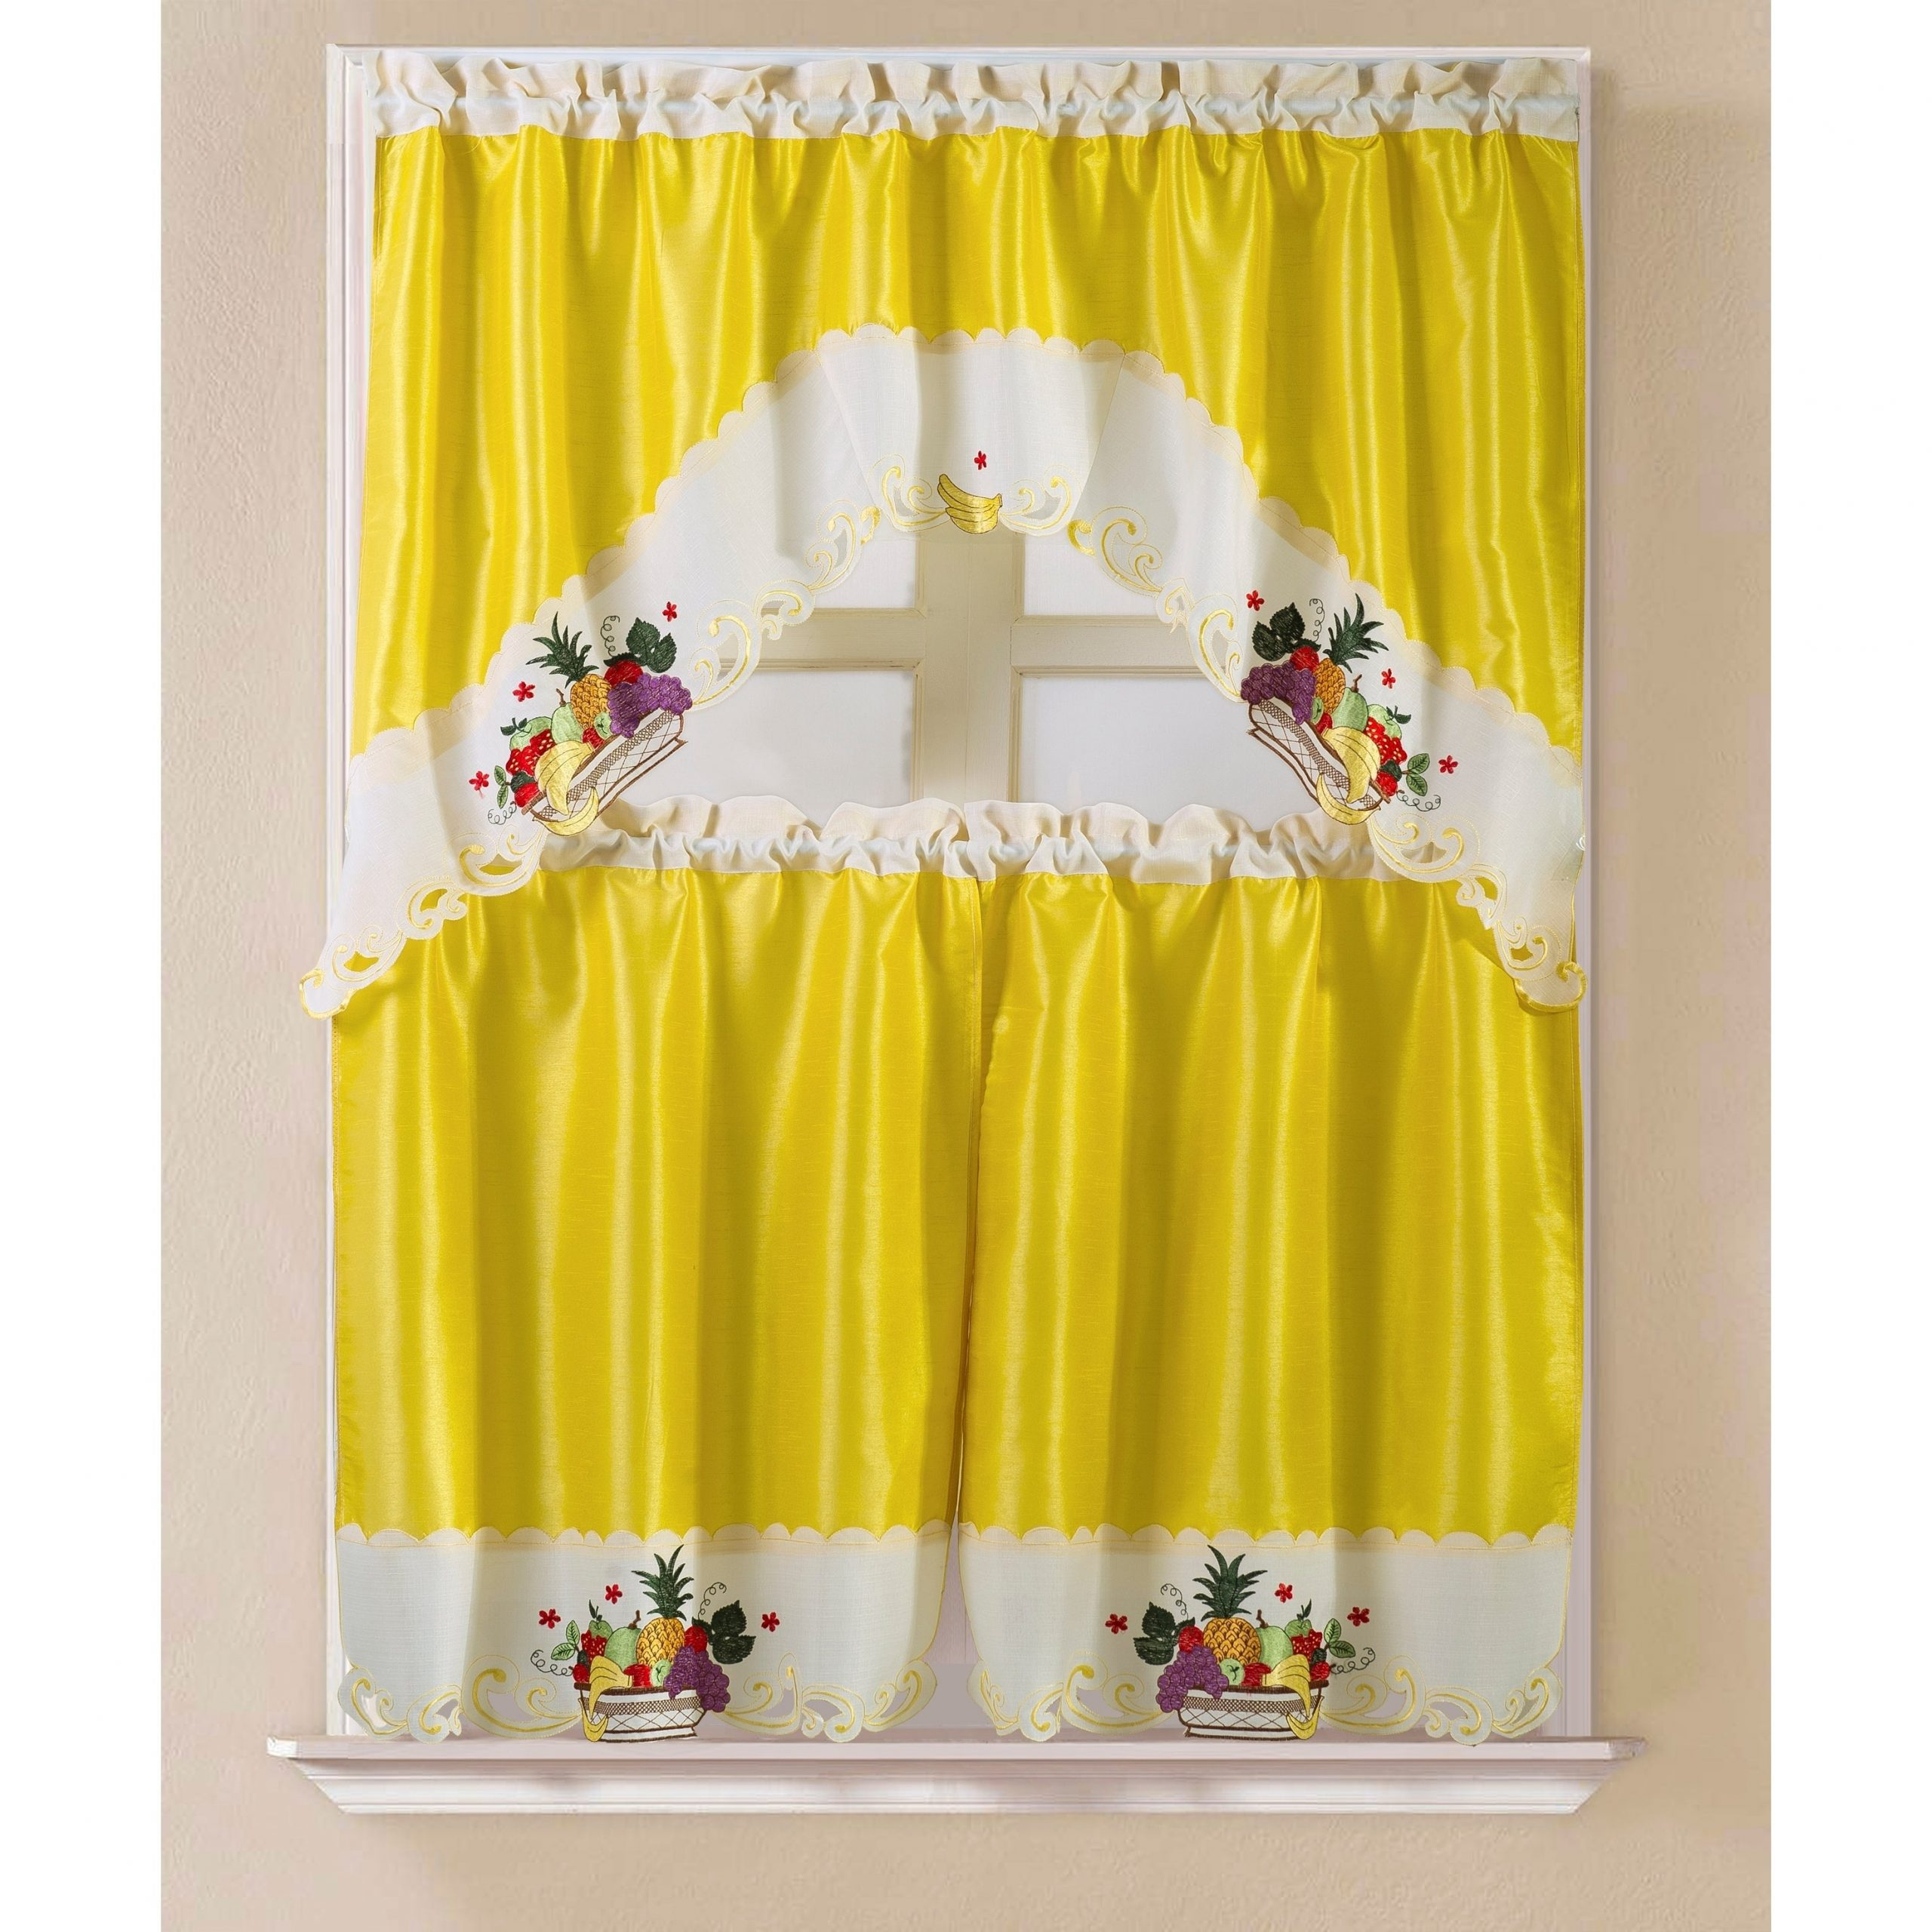 Porch & Den Eastview Faux Silk 3 Piece Kitchen Curtain Set Pertaining To Preferred Faux Silk 3 Piece Kitchen Curtain Sets (View 13 of 20)